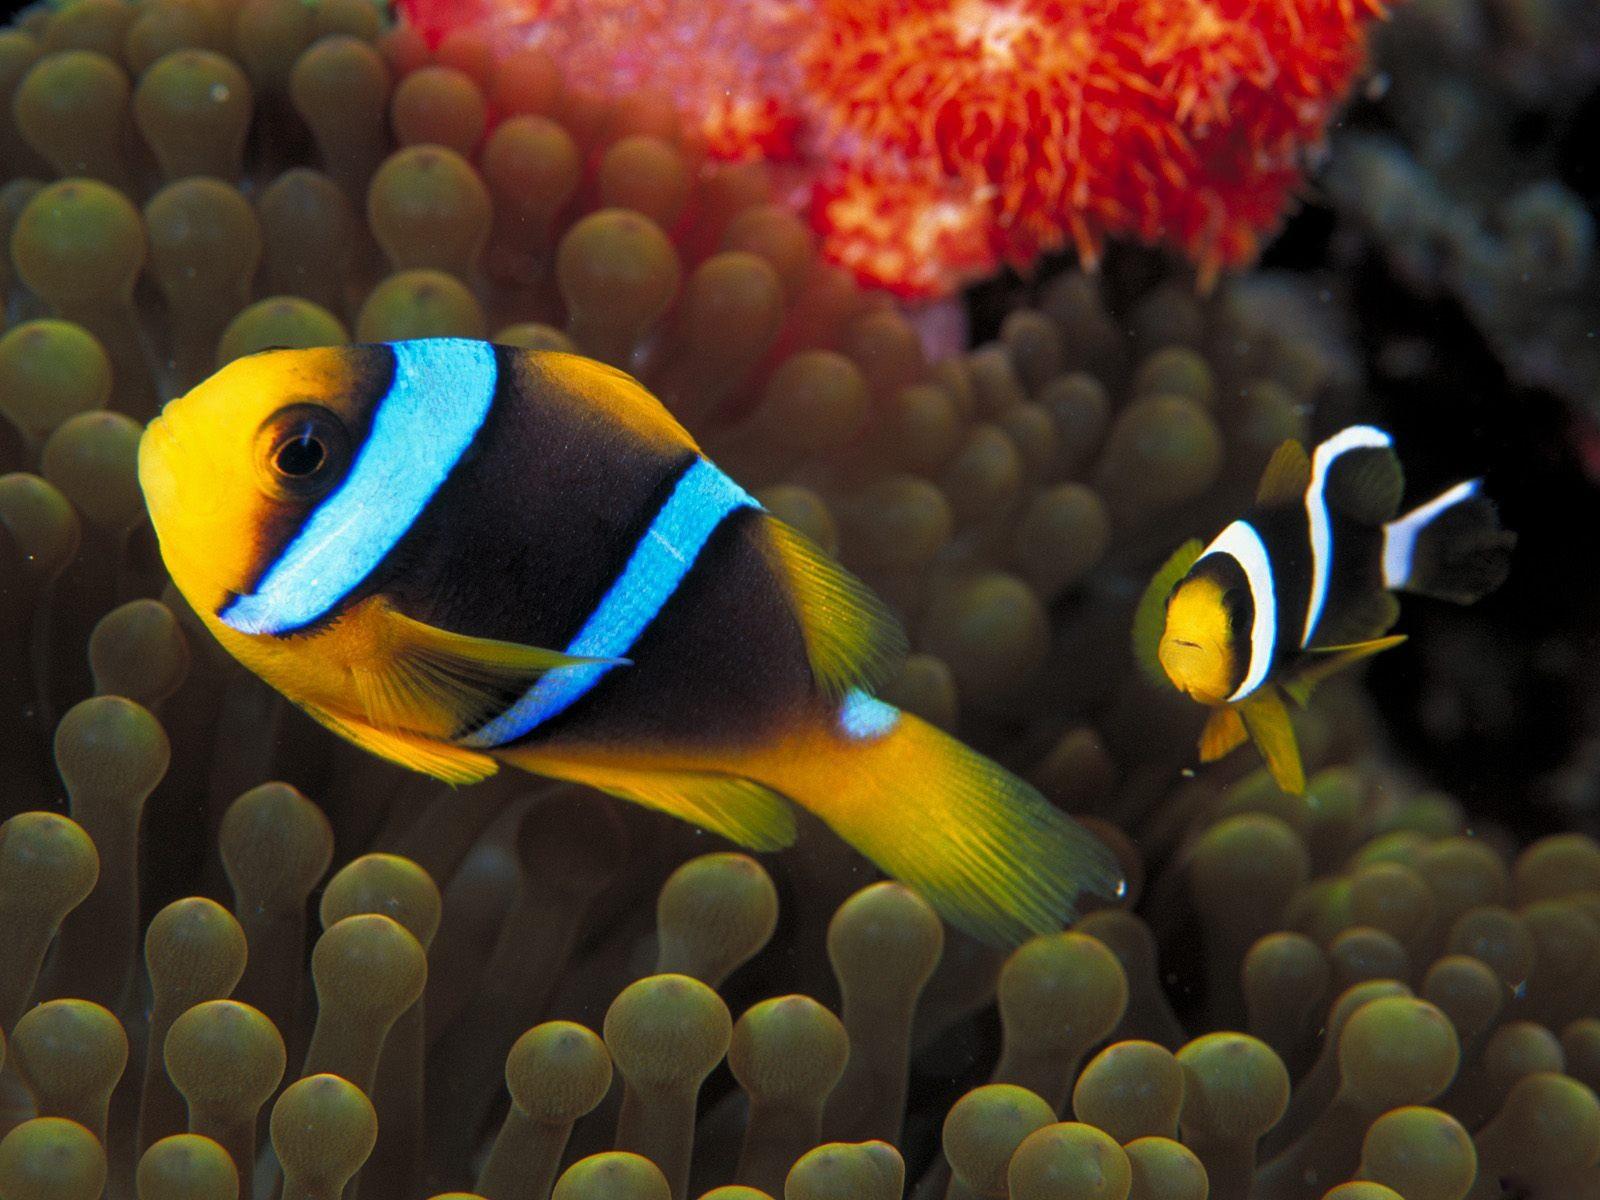 General 1600x1200 sea underwater sea anemones fish clownfish sea life animals